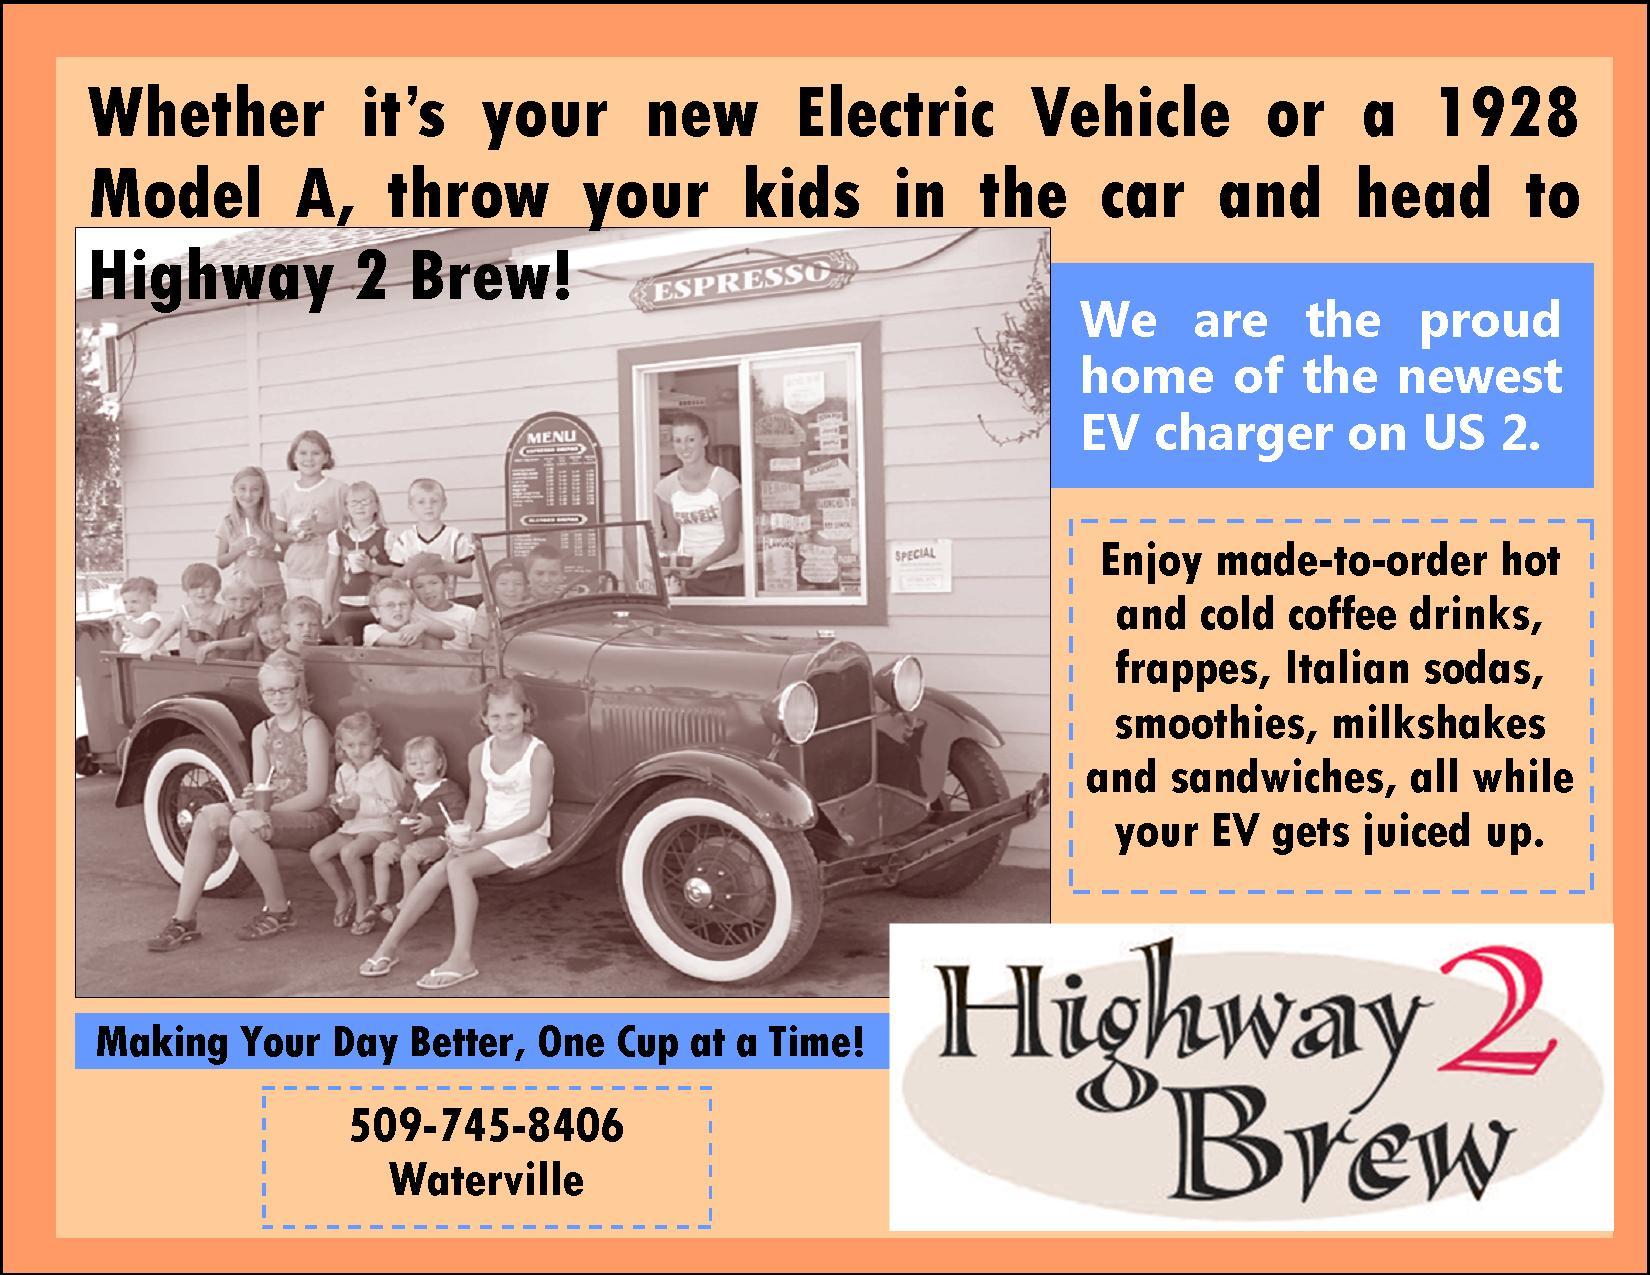 Highway 2 Brew.jpg